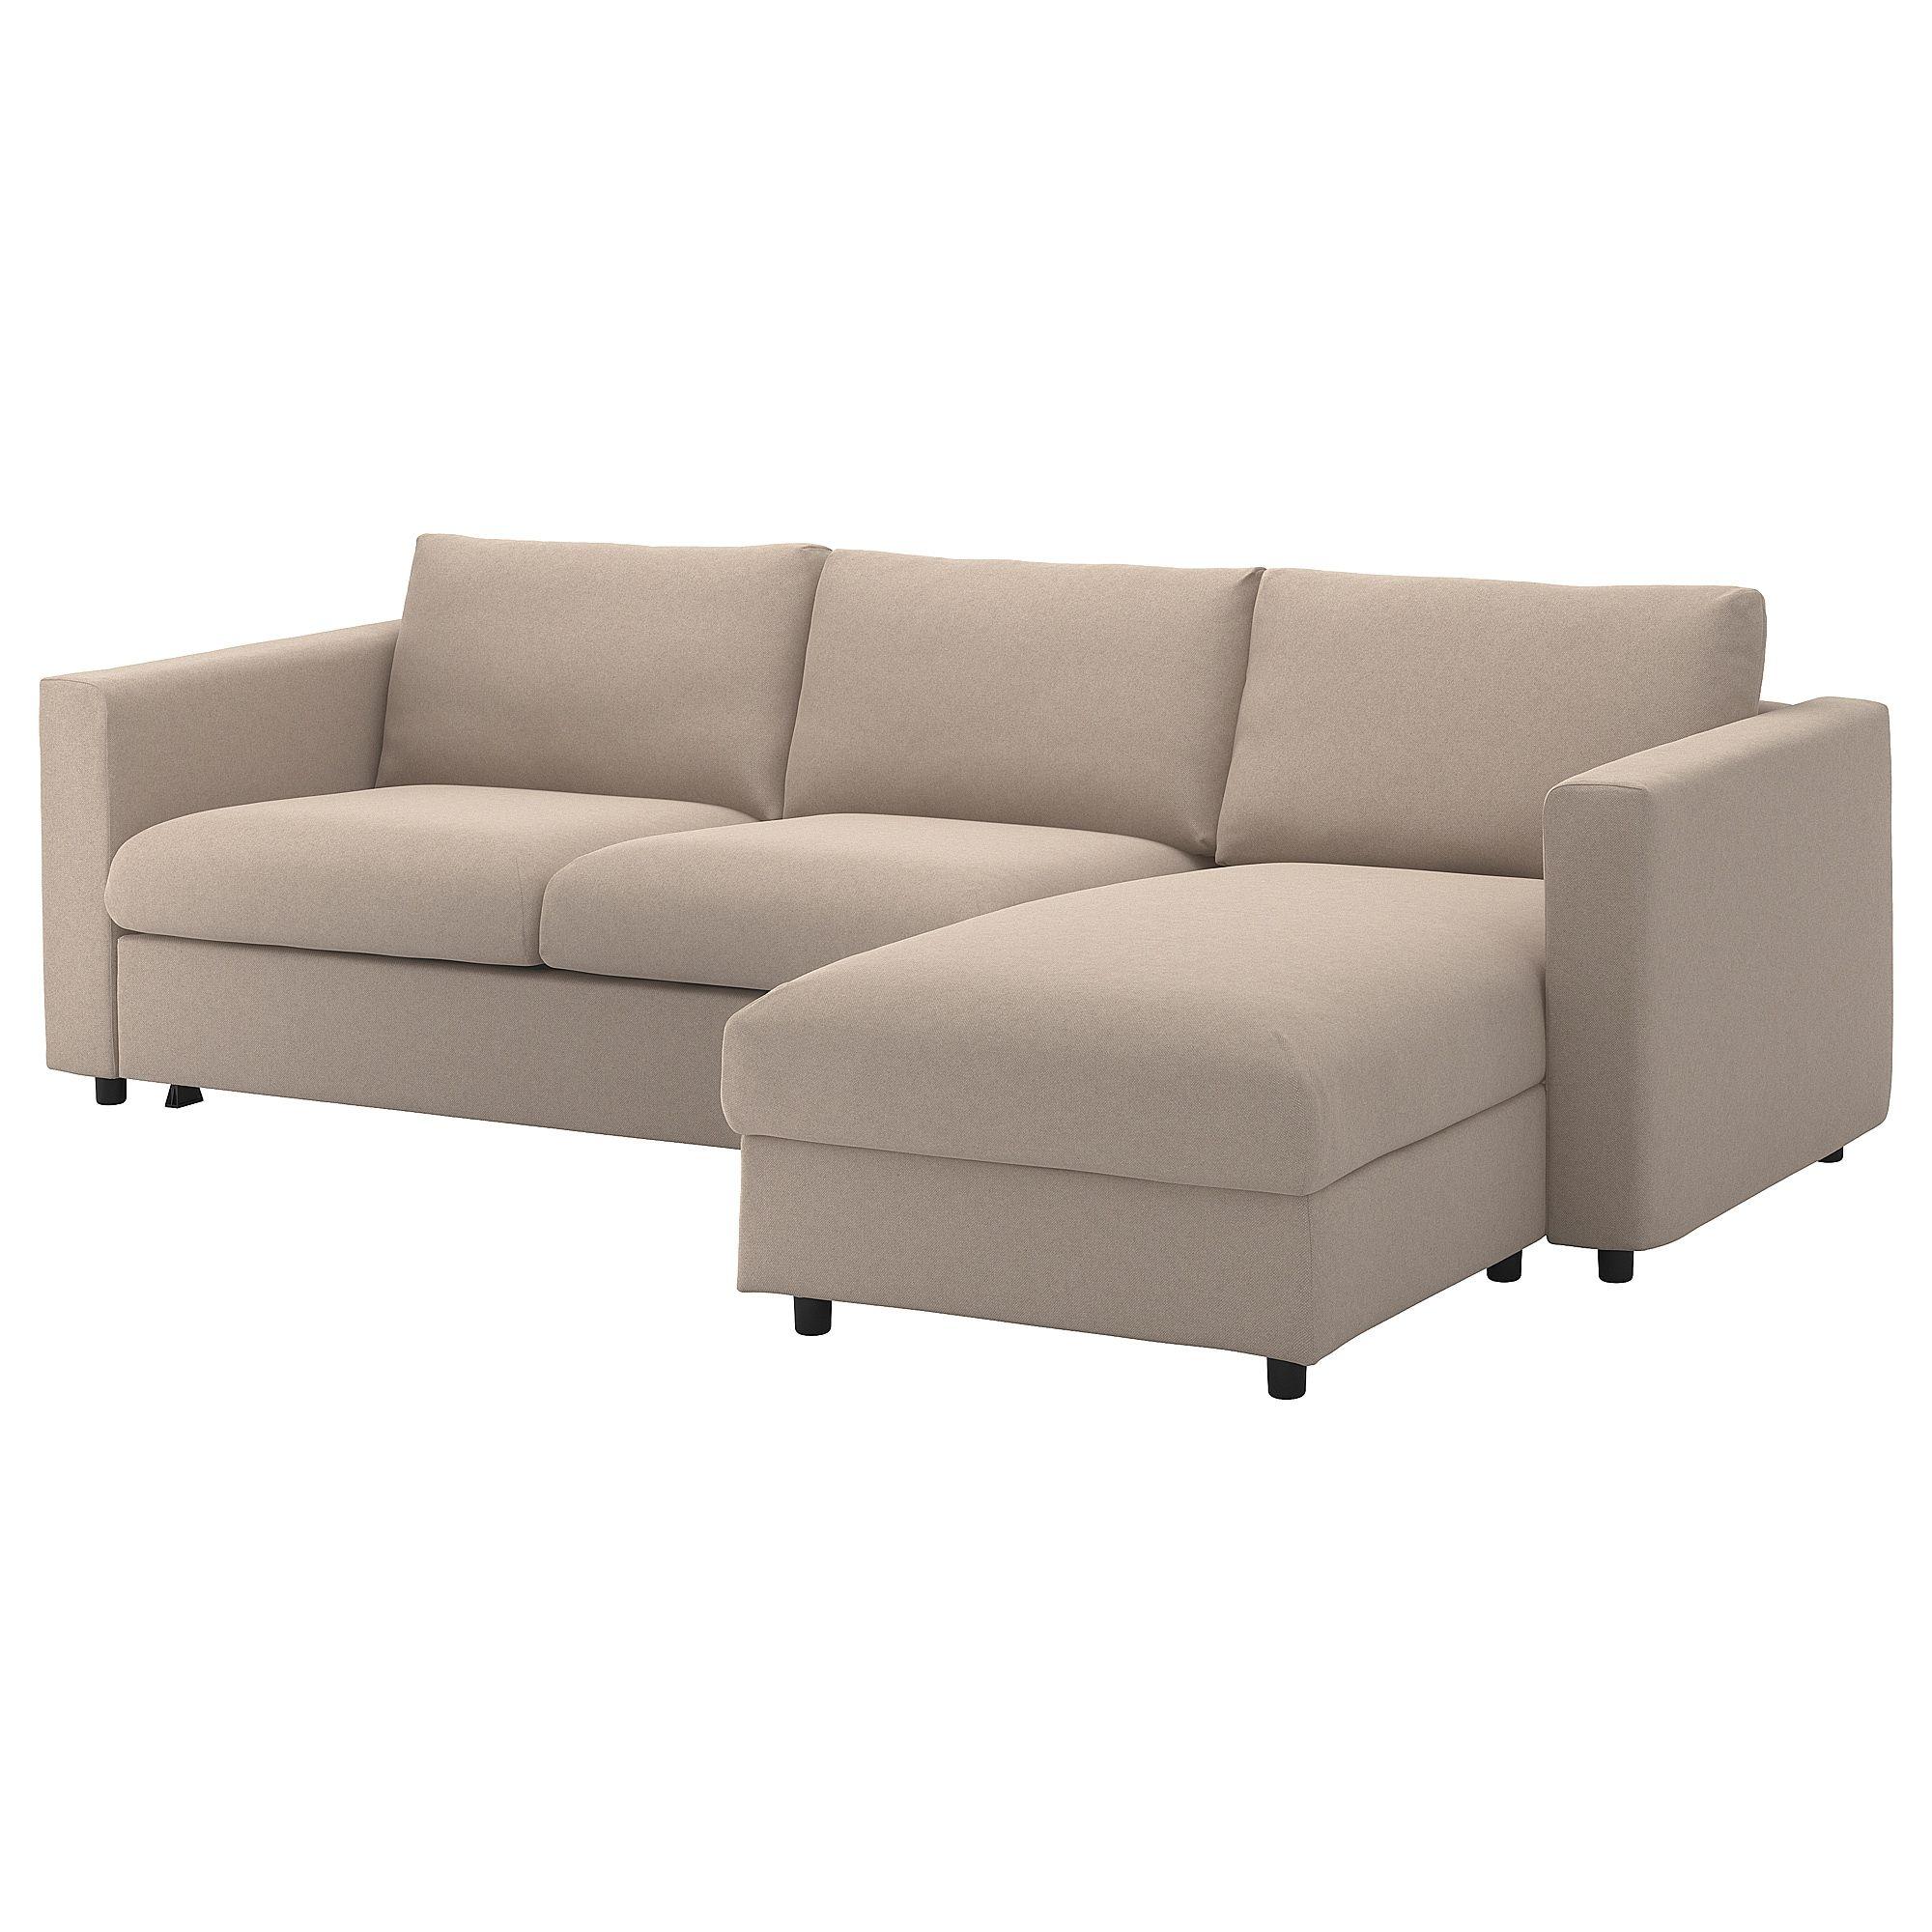 Finnala Sleeper Sofa With Chaise Tallmyra Beige Ikea In 2020 Sofa Bed With Chaise Sleeper Sofa 3 Seat Sofa Bed